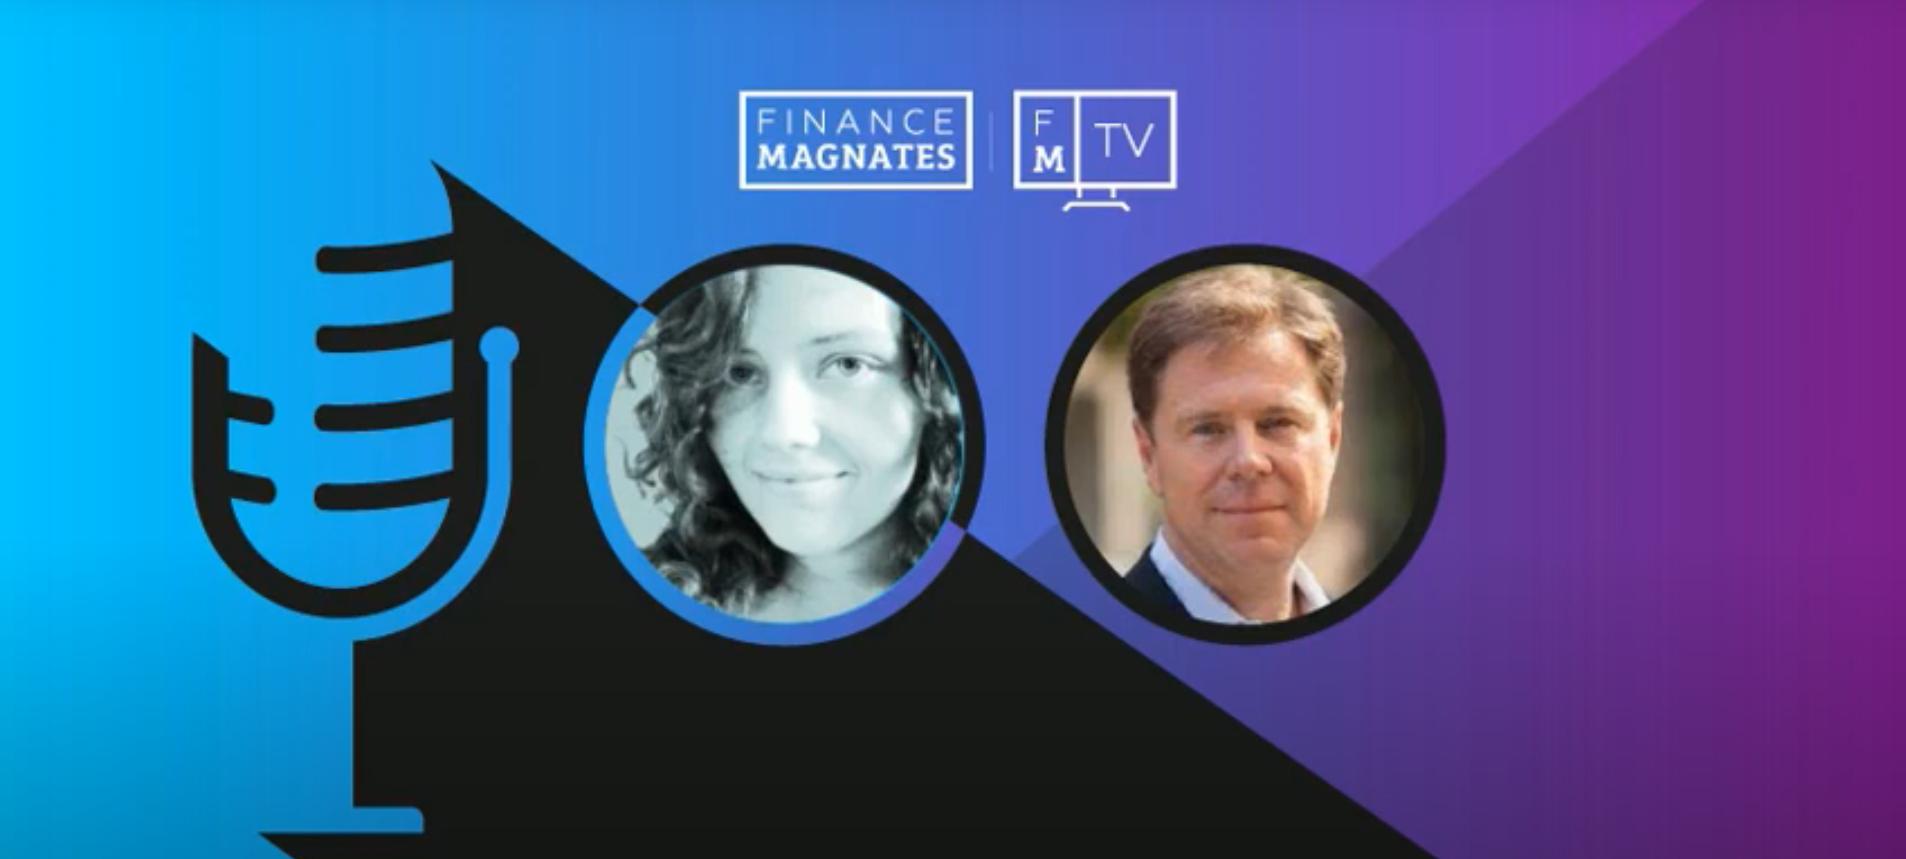 Finance Magnate TV